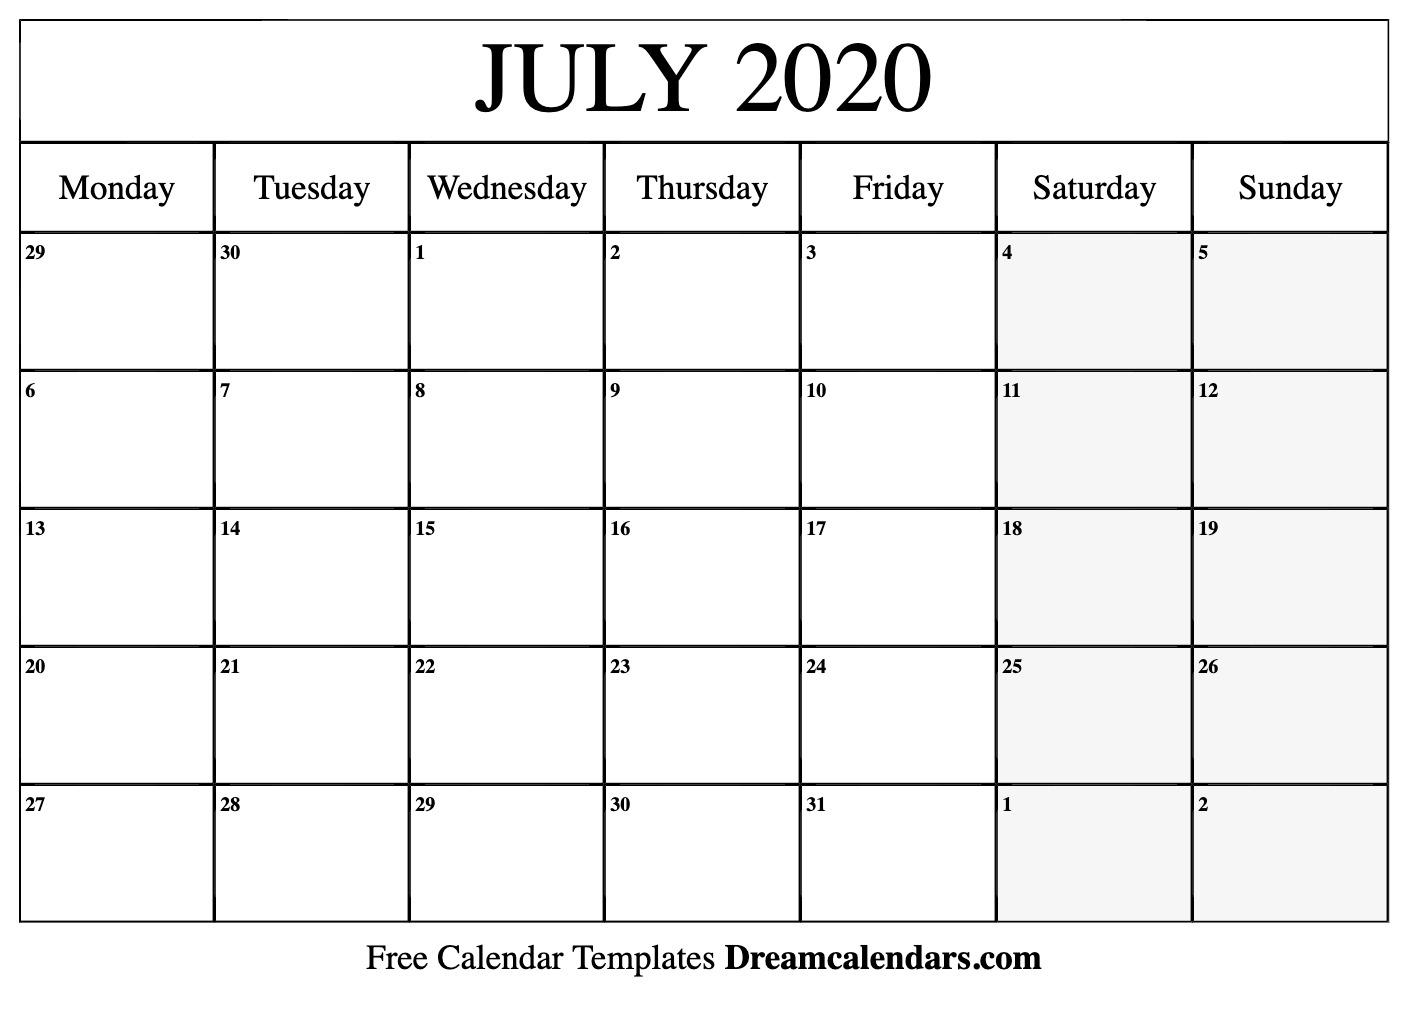 Free July 2020 Printable Calendar | Dream Calendars-Blank